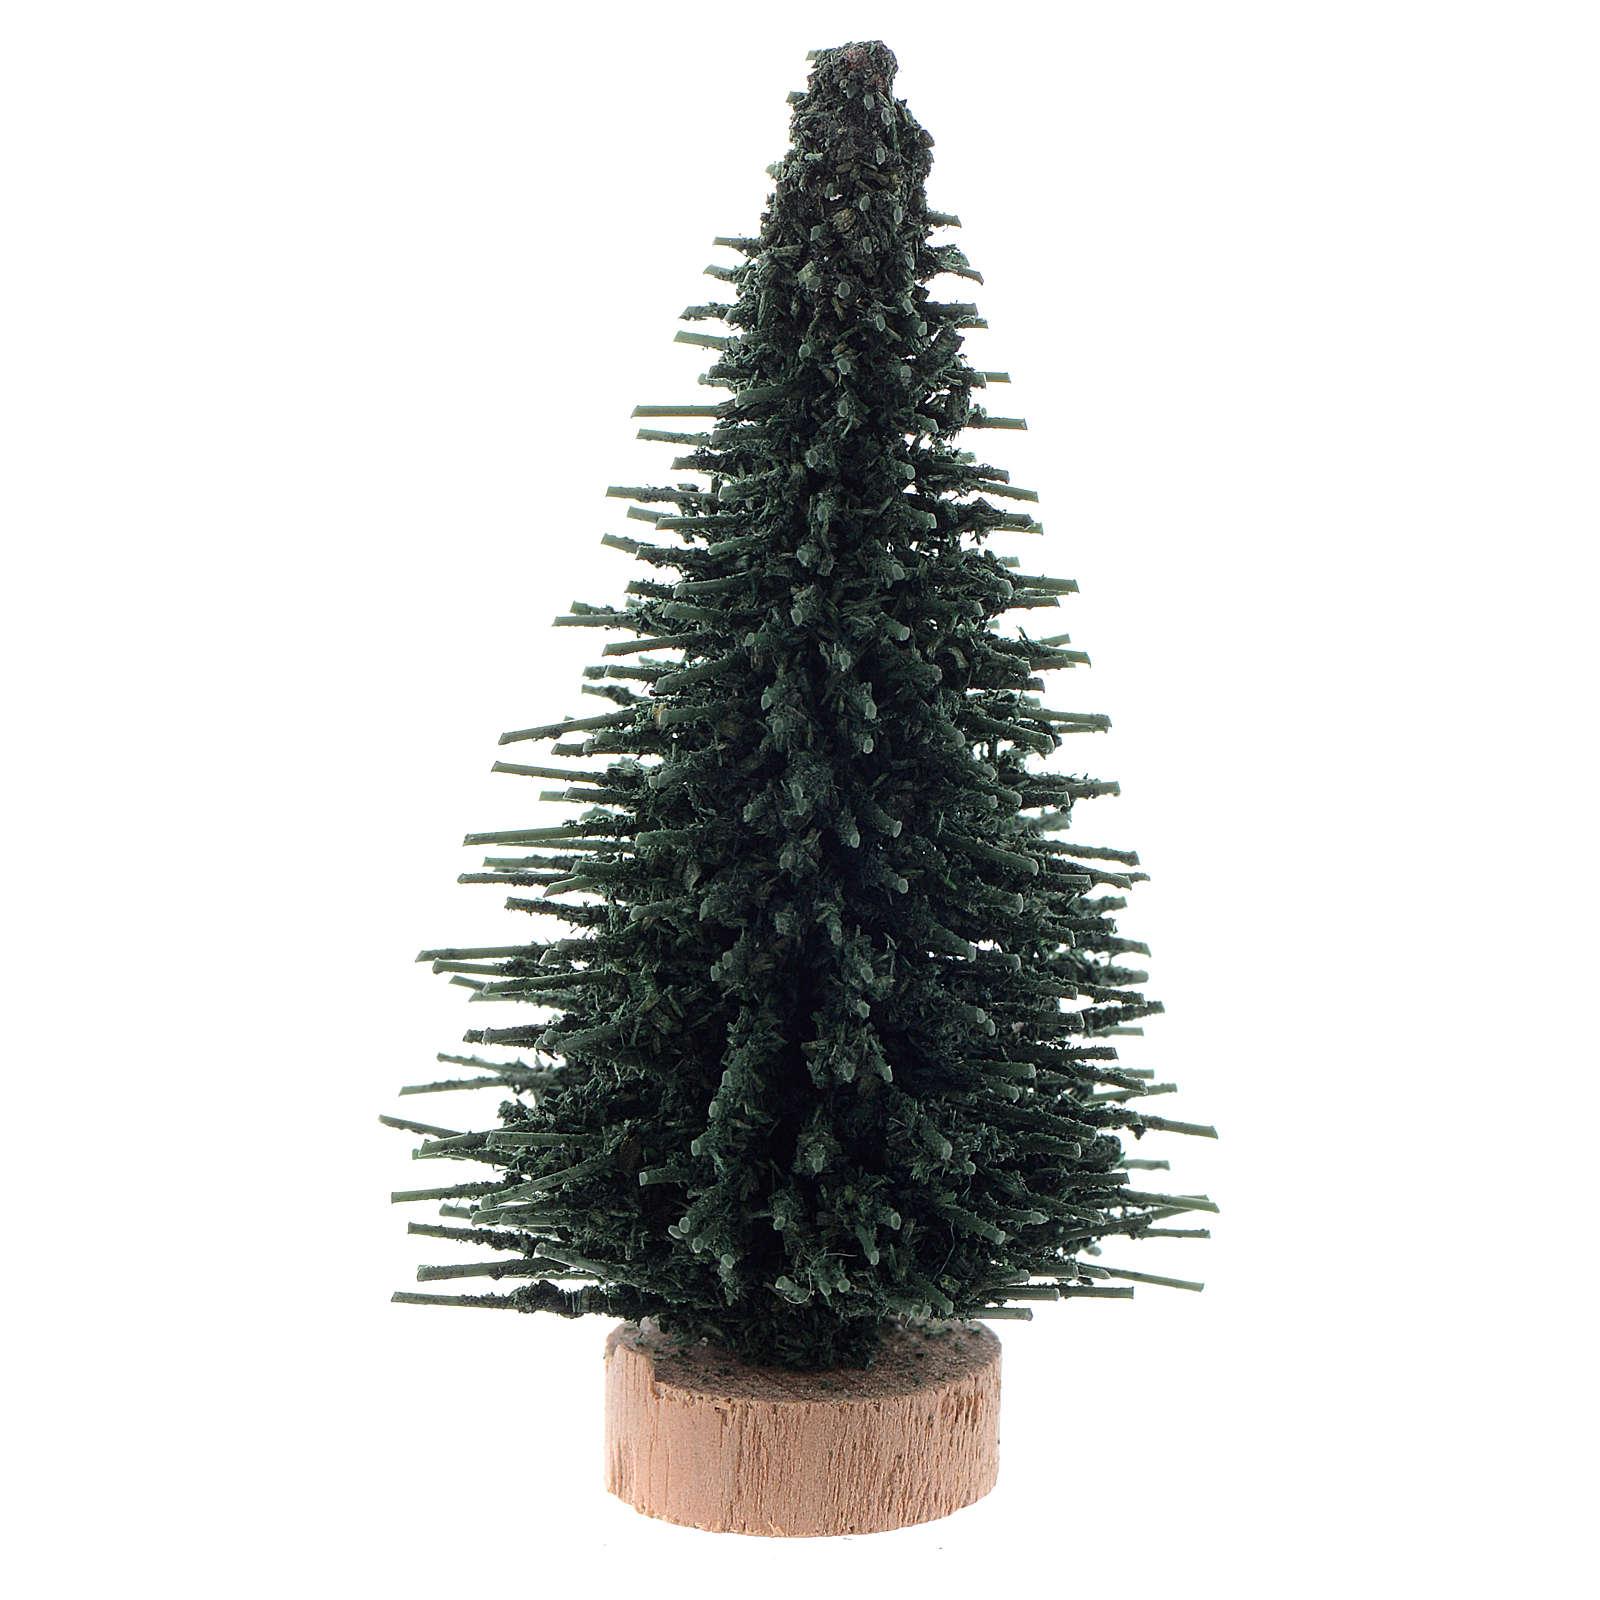 Green Pine Tree for DIY nativity 4